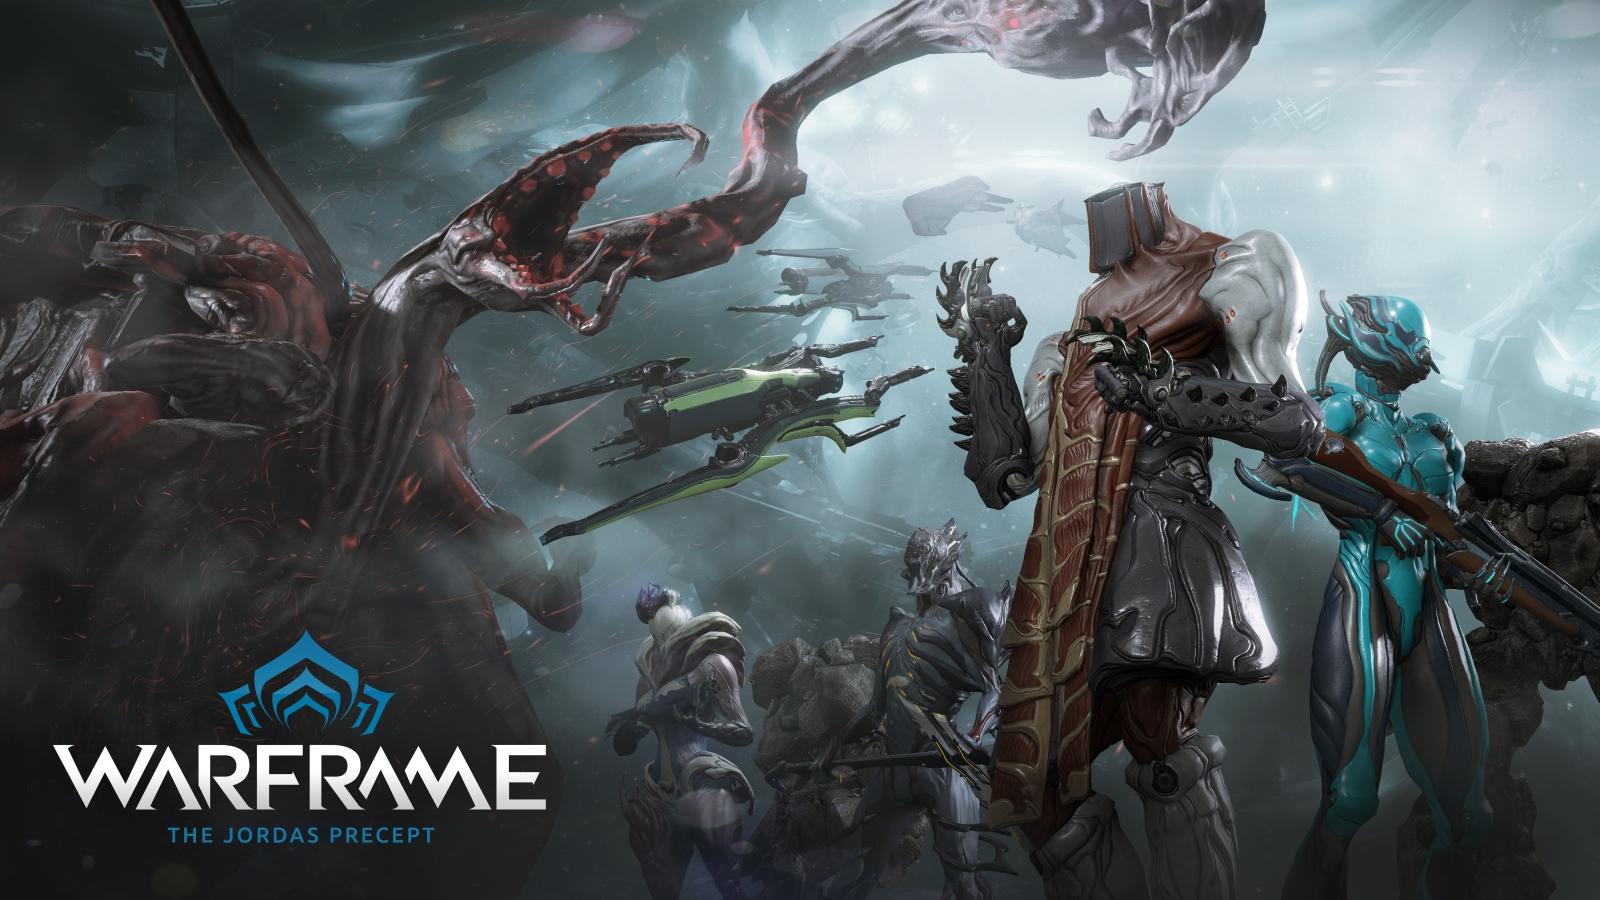 Warframe: The Jordas Precept available on consoles news header